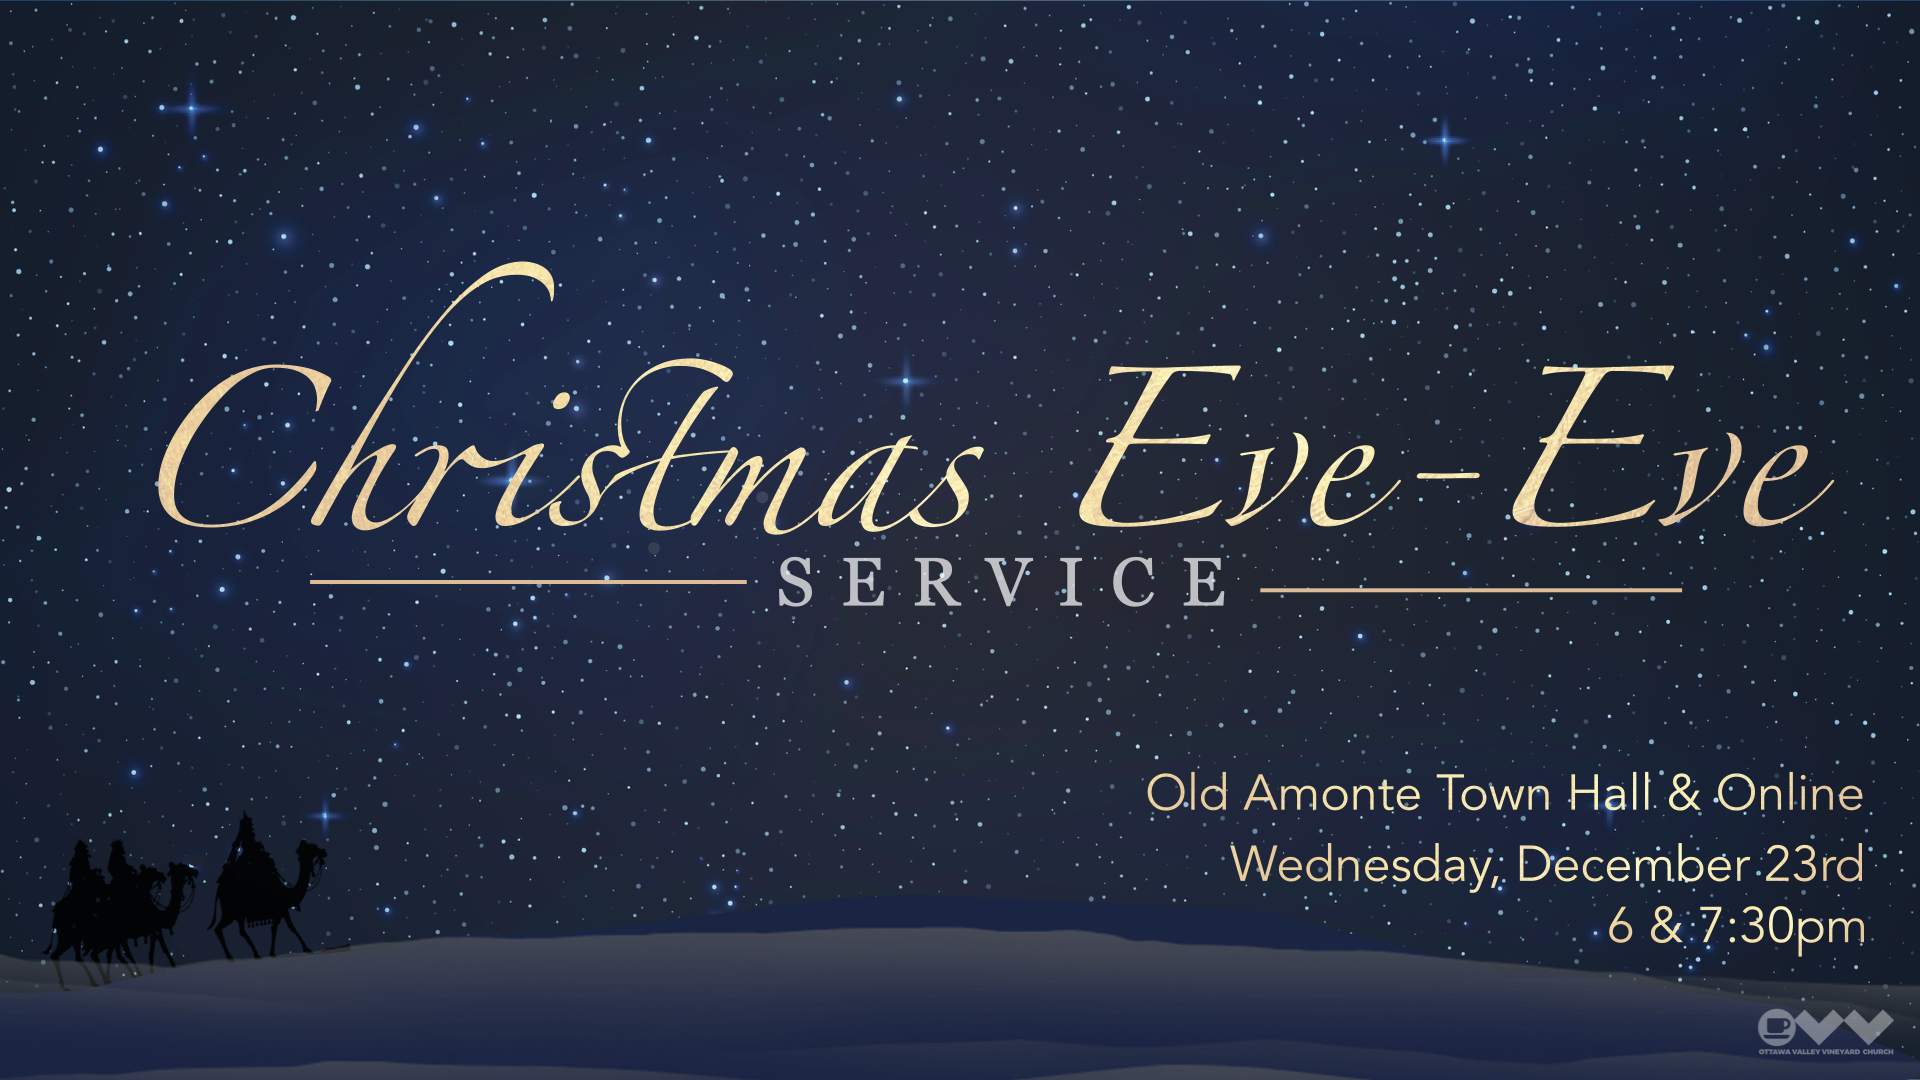 Christmas Eve Eve images.004.jpeg